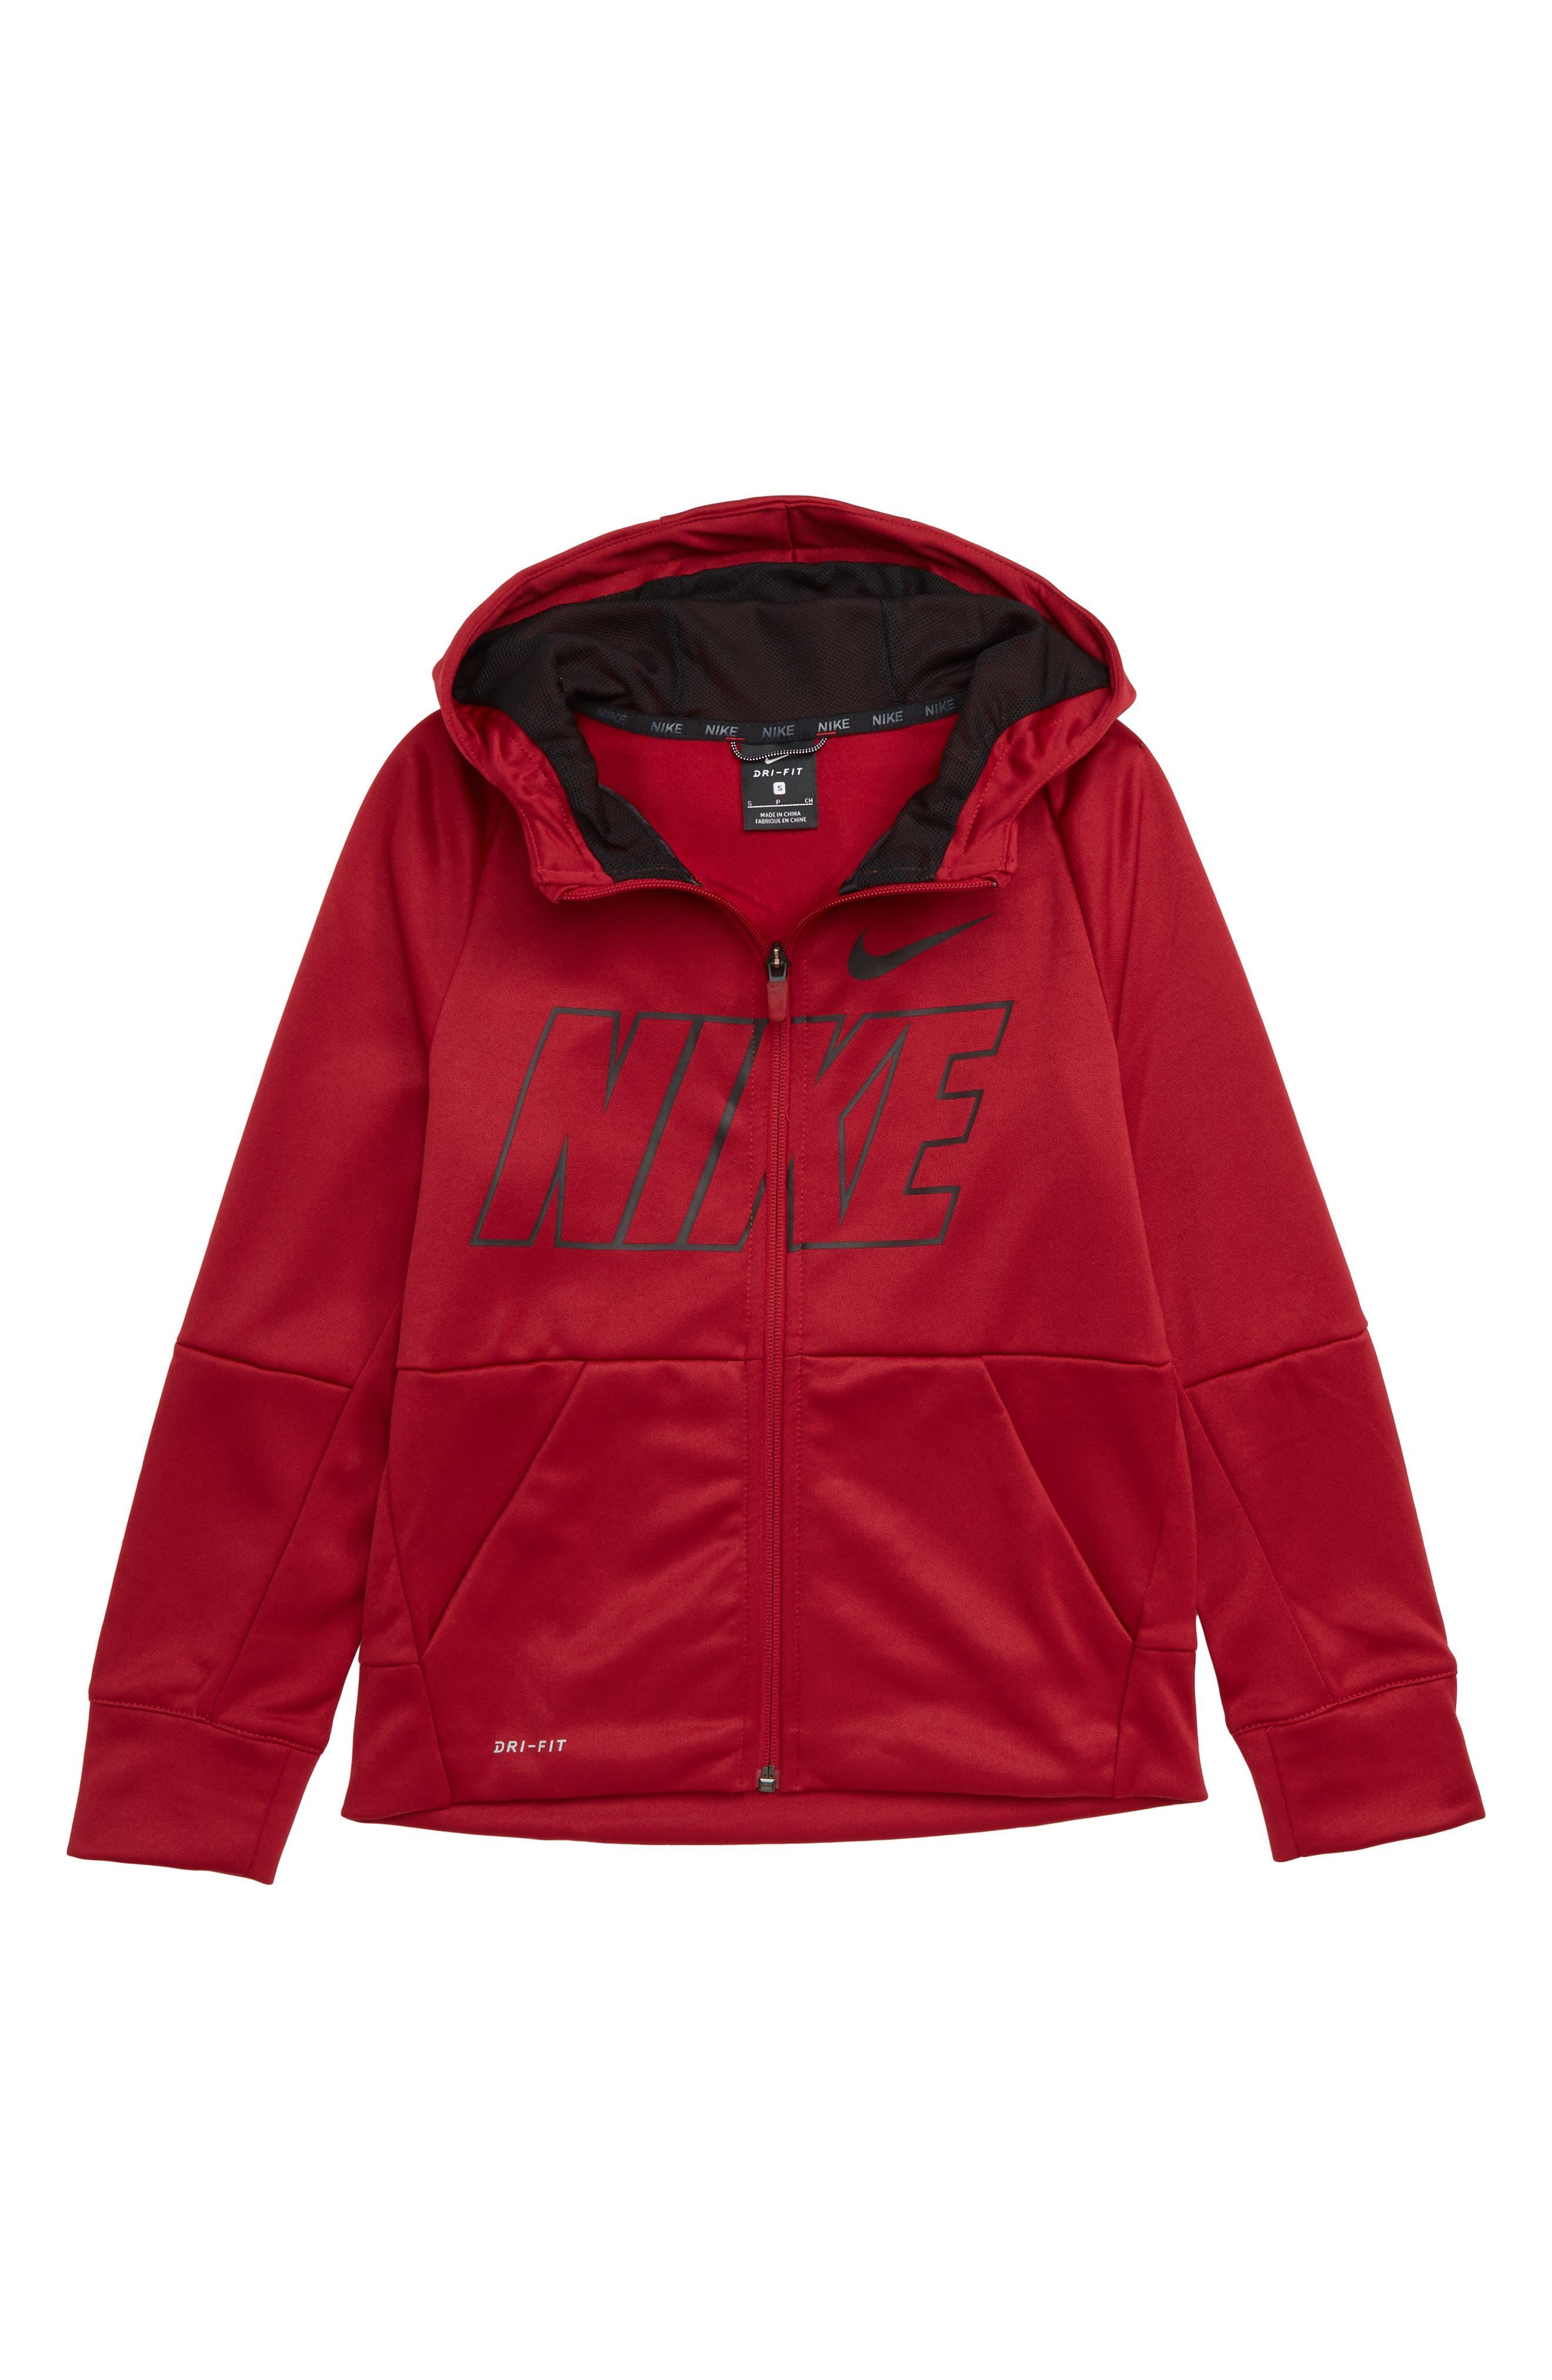 Boys Nike Therma Dry Zip Hoodie Size L (14)  Blue